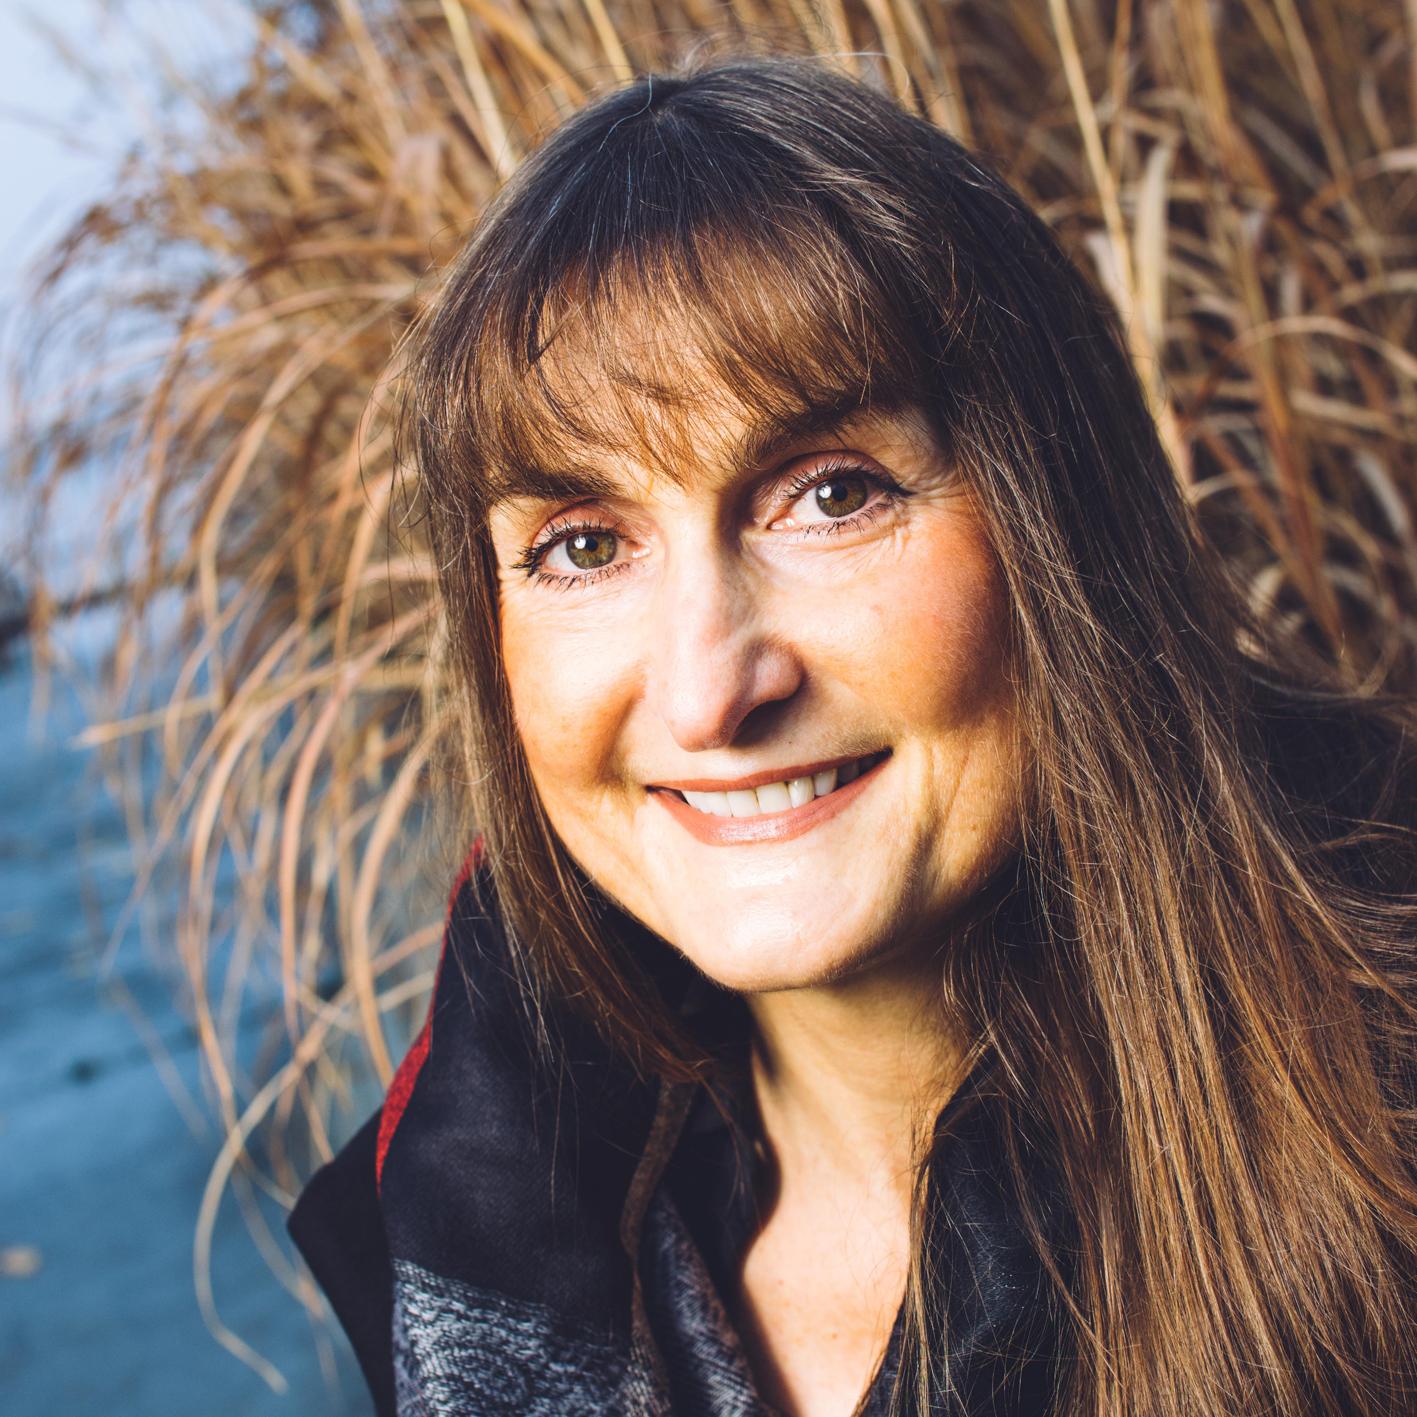 Wanda Grimsgaard. Photo: Gaute Gjøl Dahle